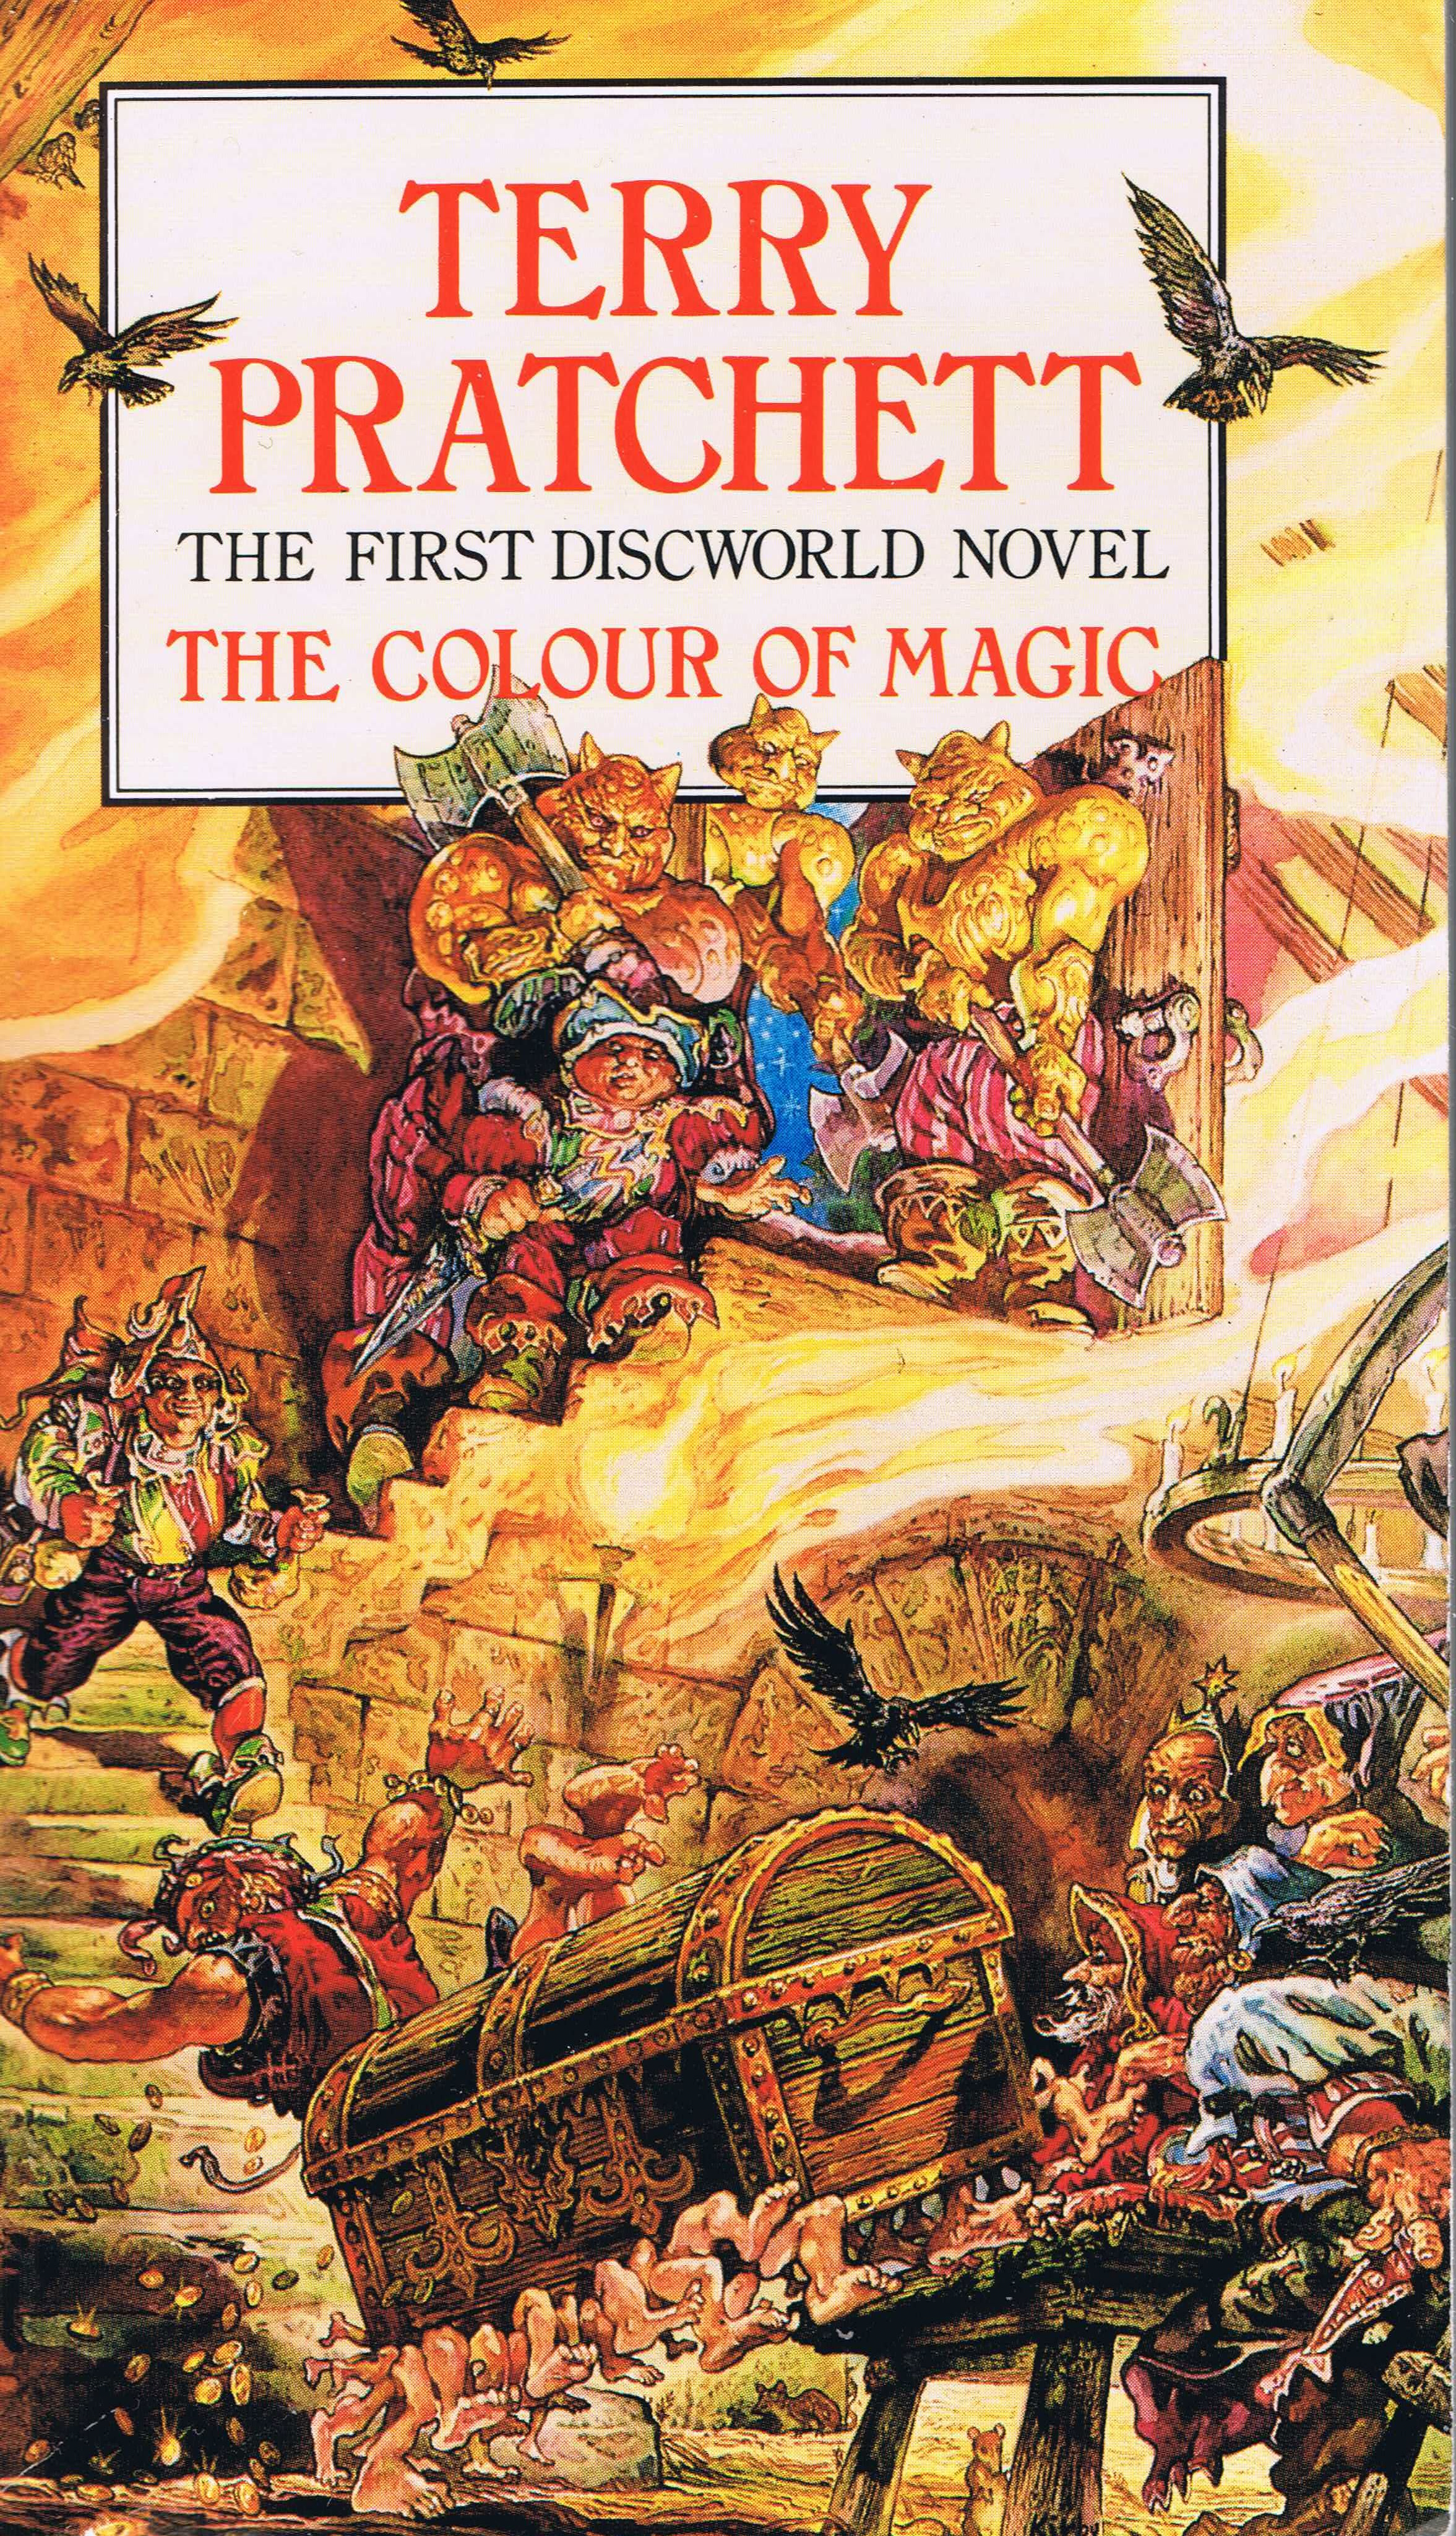 Fantastic fun book to color - Discworld Jpg